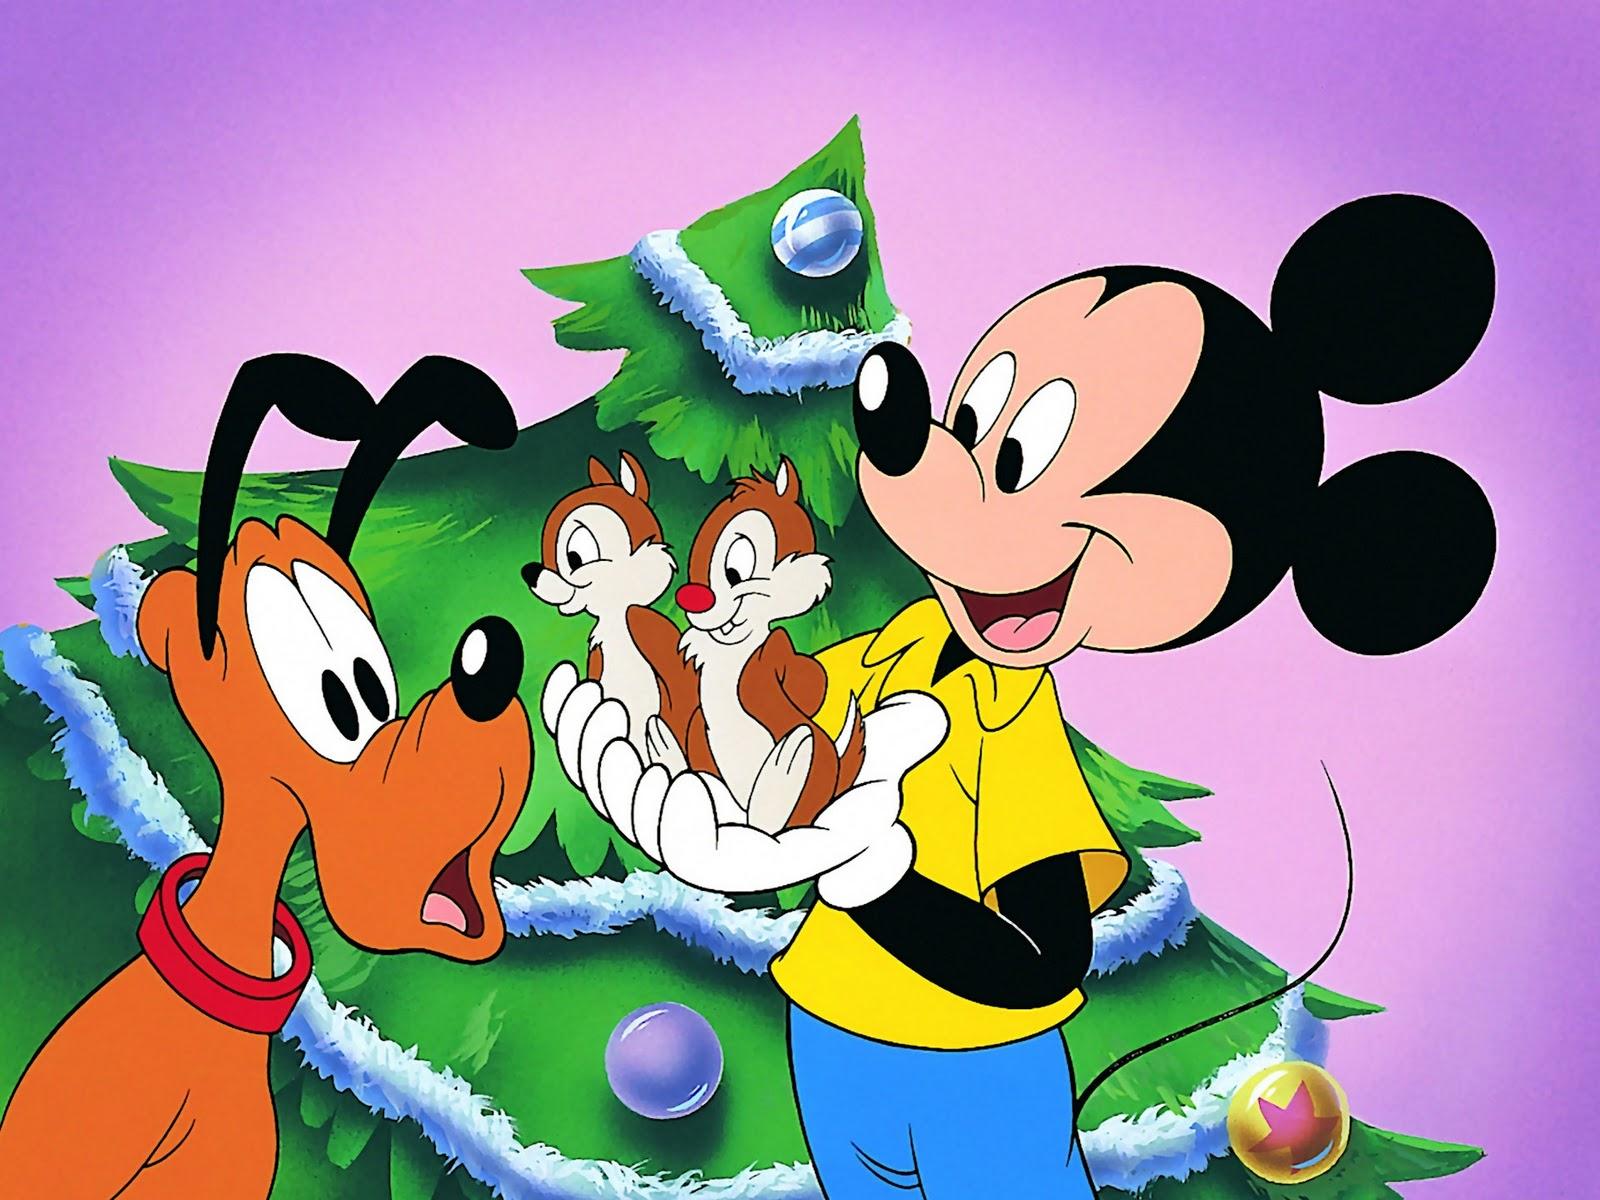 http://4.bp.blogspot.com/-2jec6PLM9RM/TdpqDkctiyI/AAAAAAAABmM/xPnzDiASVS8/s1600/mickey_and_plutos_christmas-1920x1440.jpg